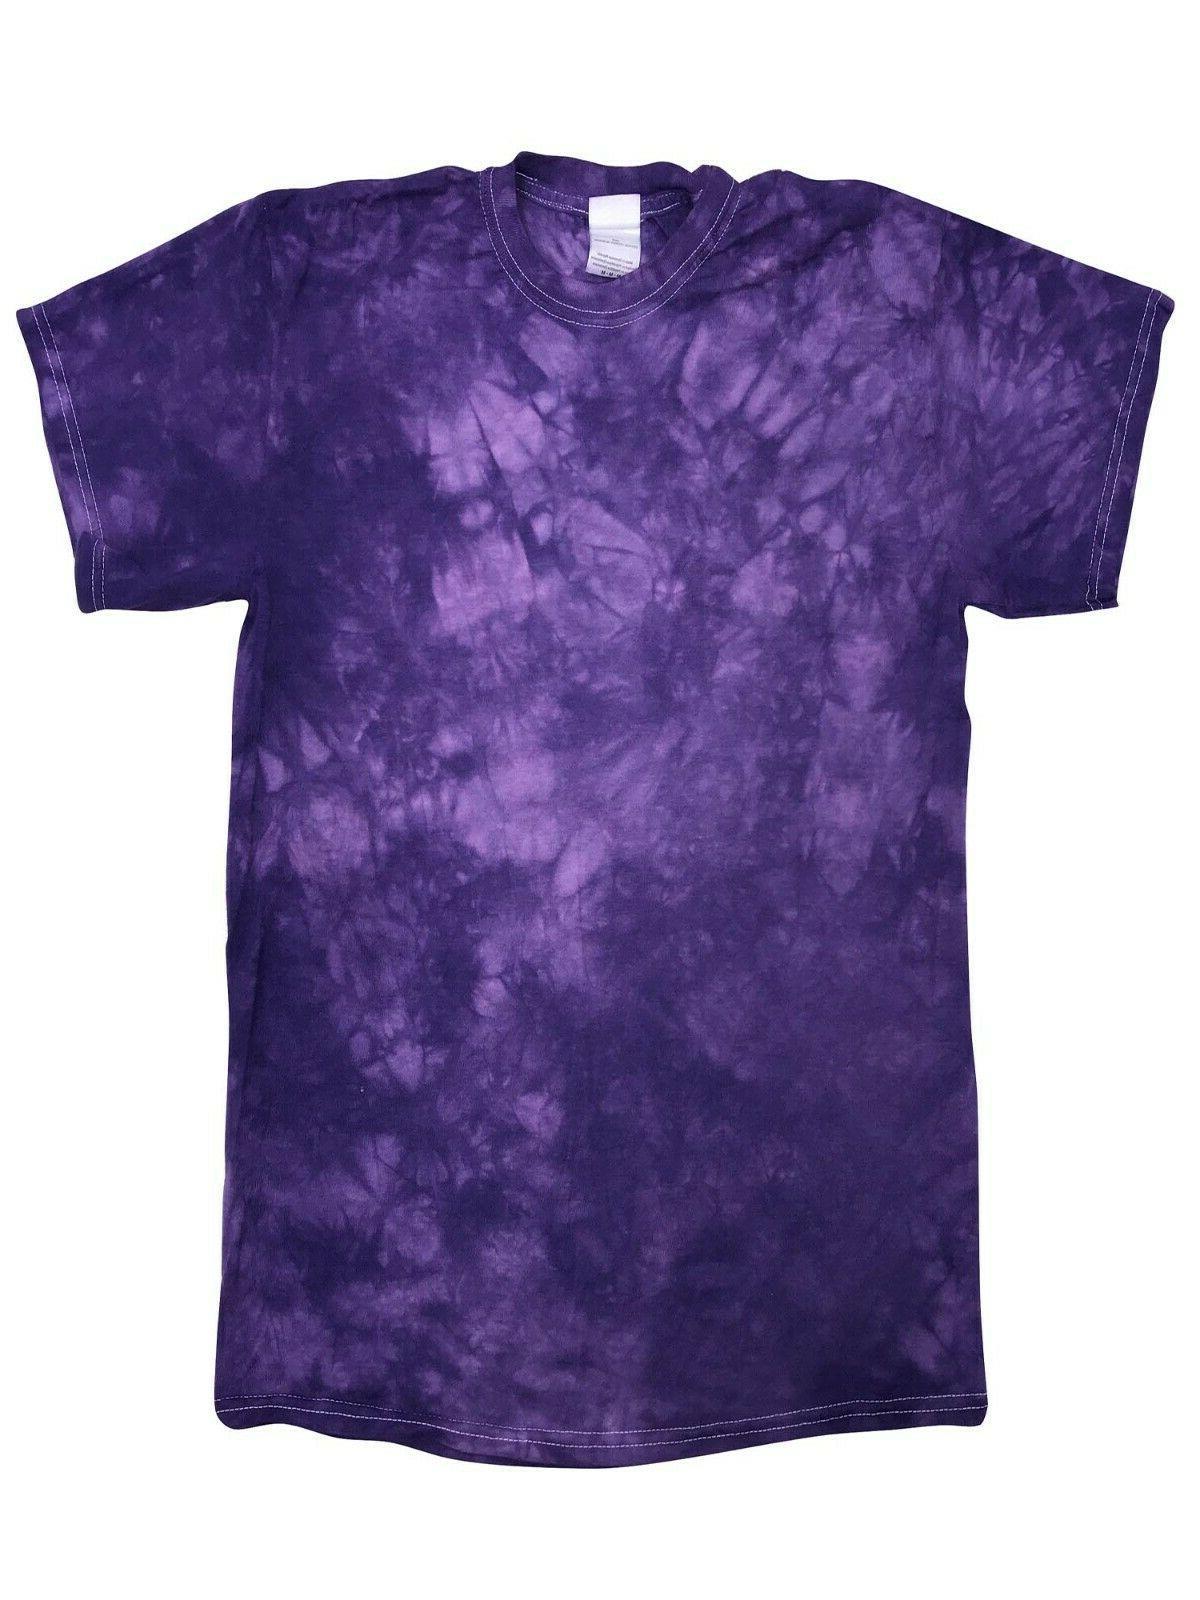 Vibrant T-Shirts SM - XXXXXL 100% Cotton